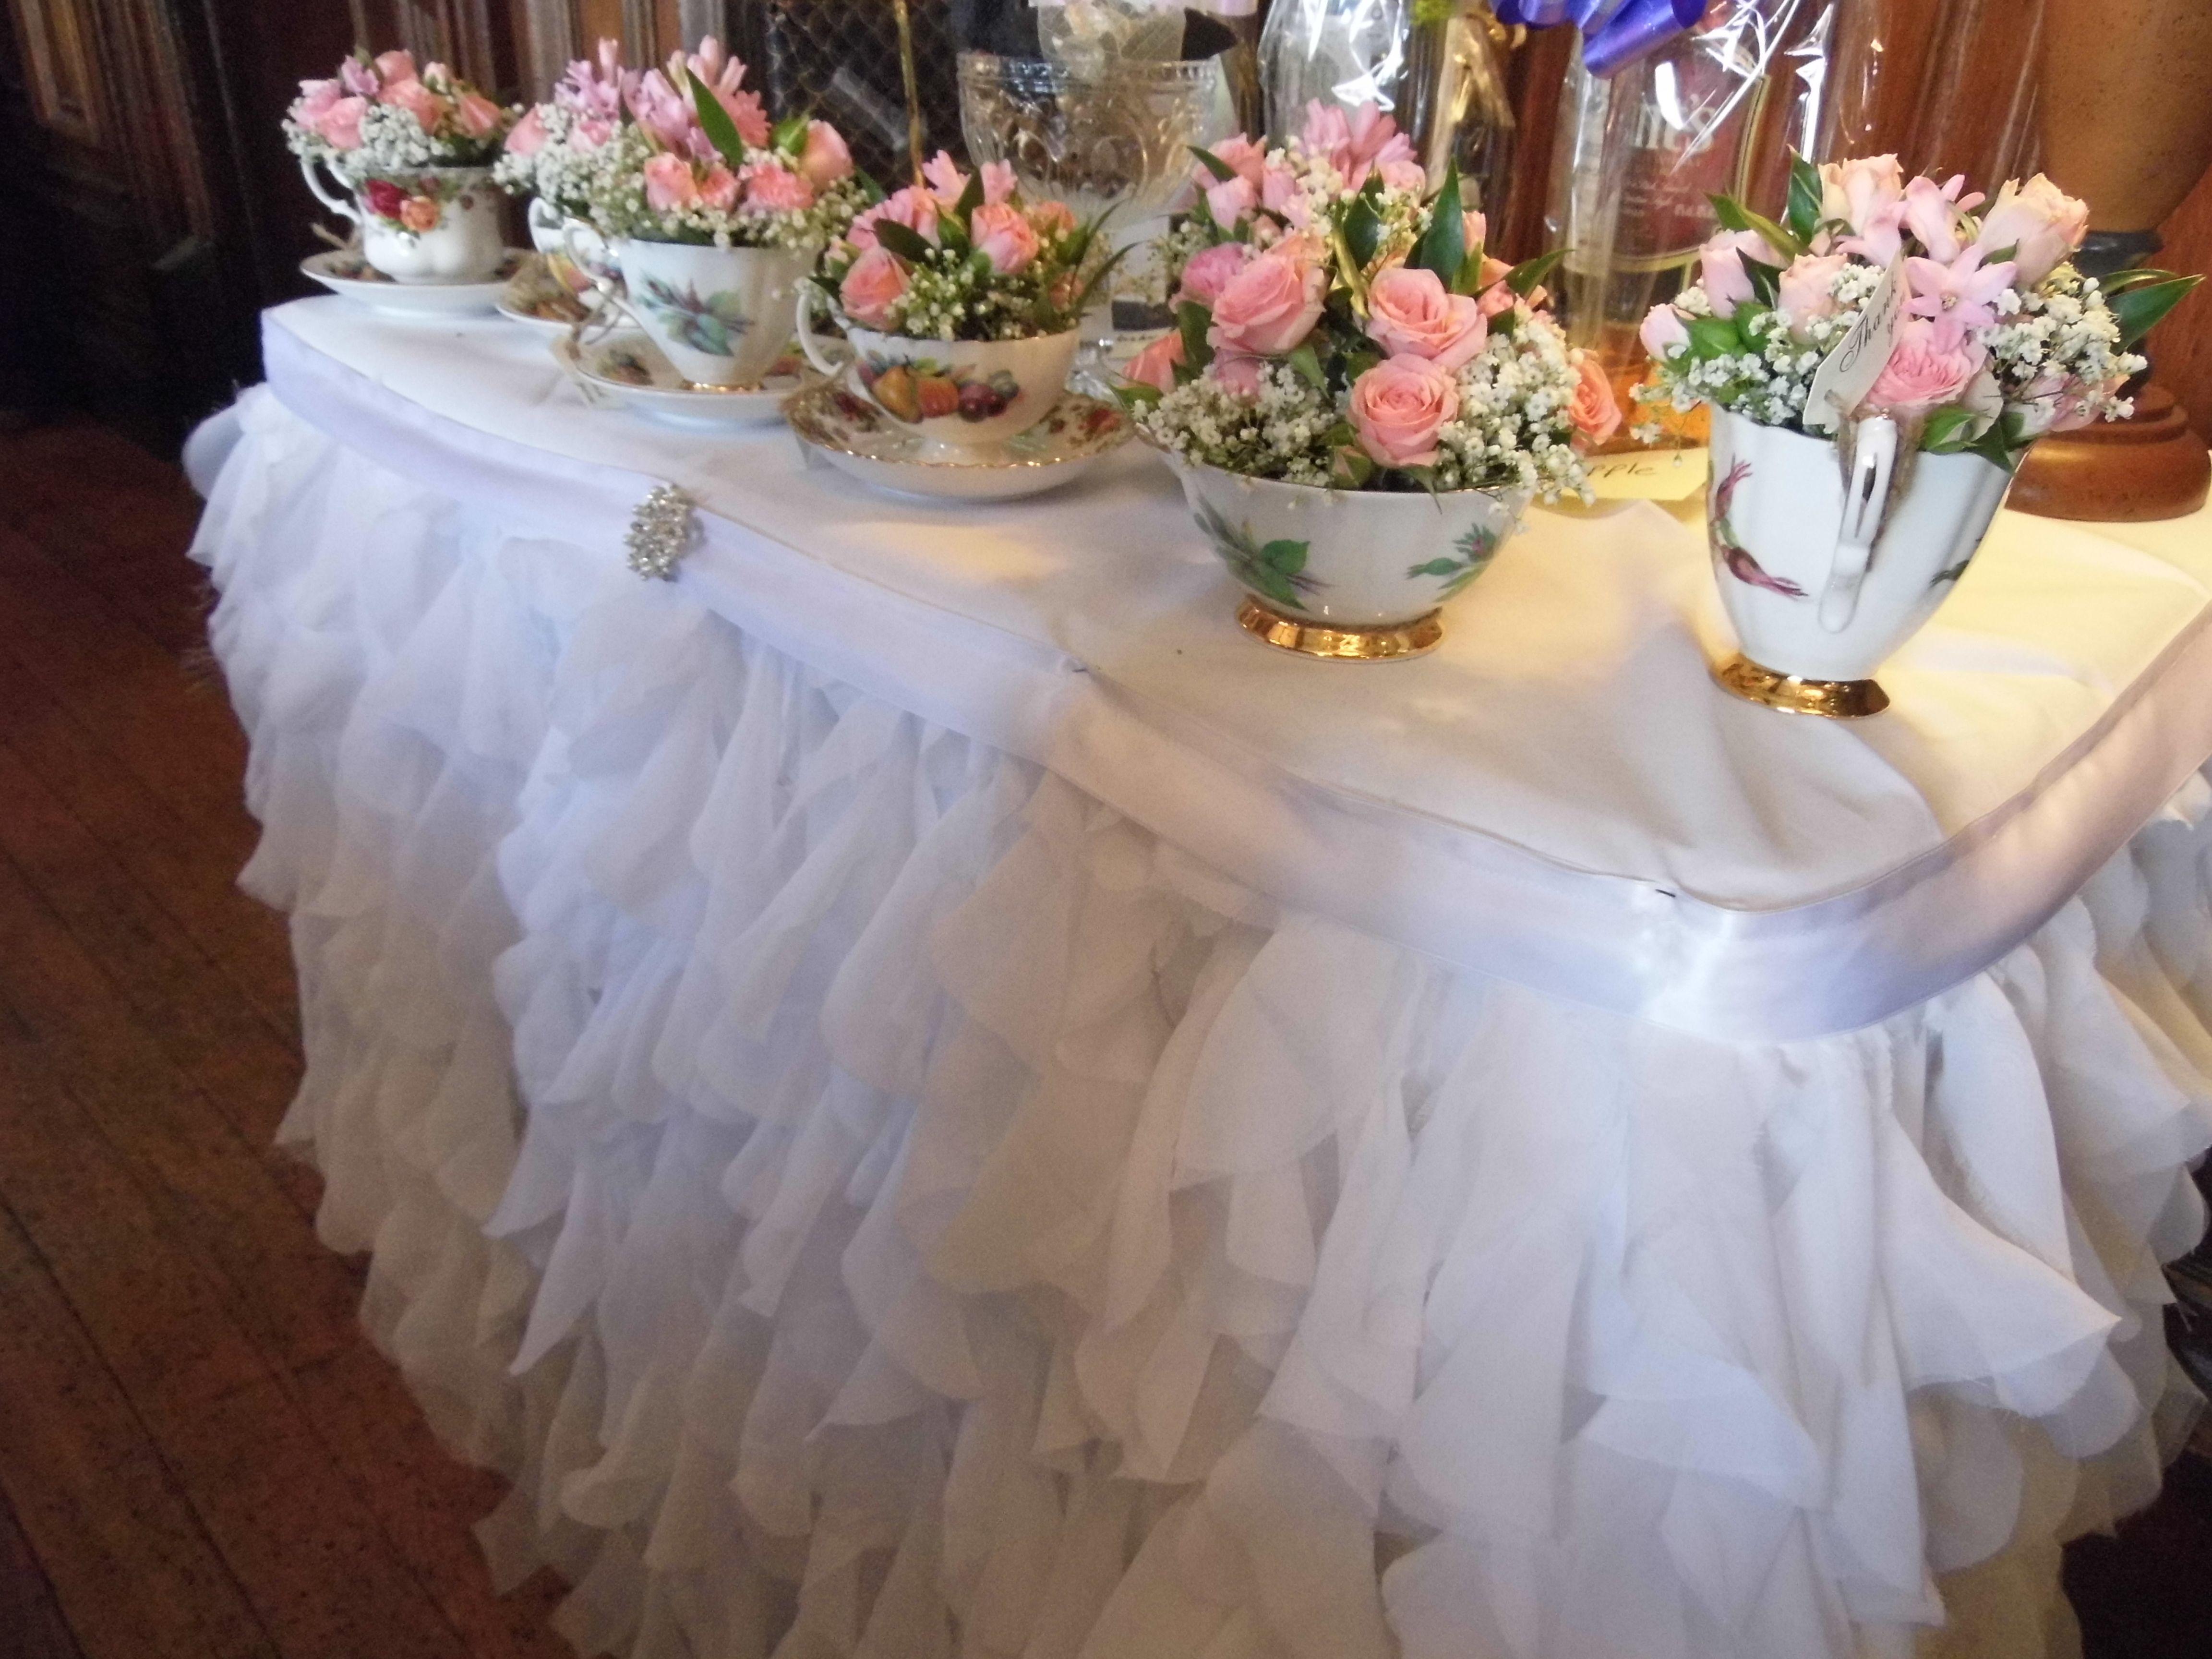 White Ruffle skirt for the Cake Table